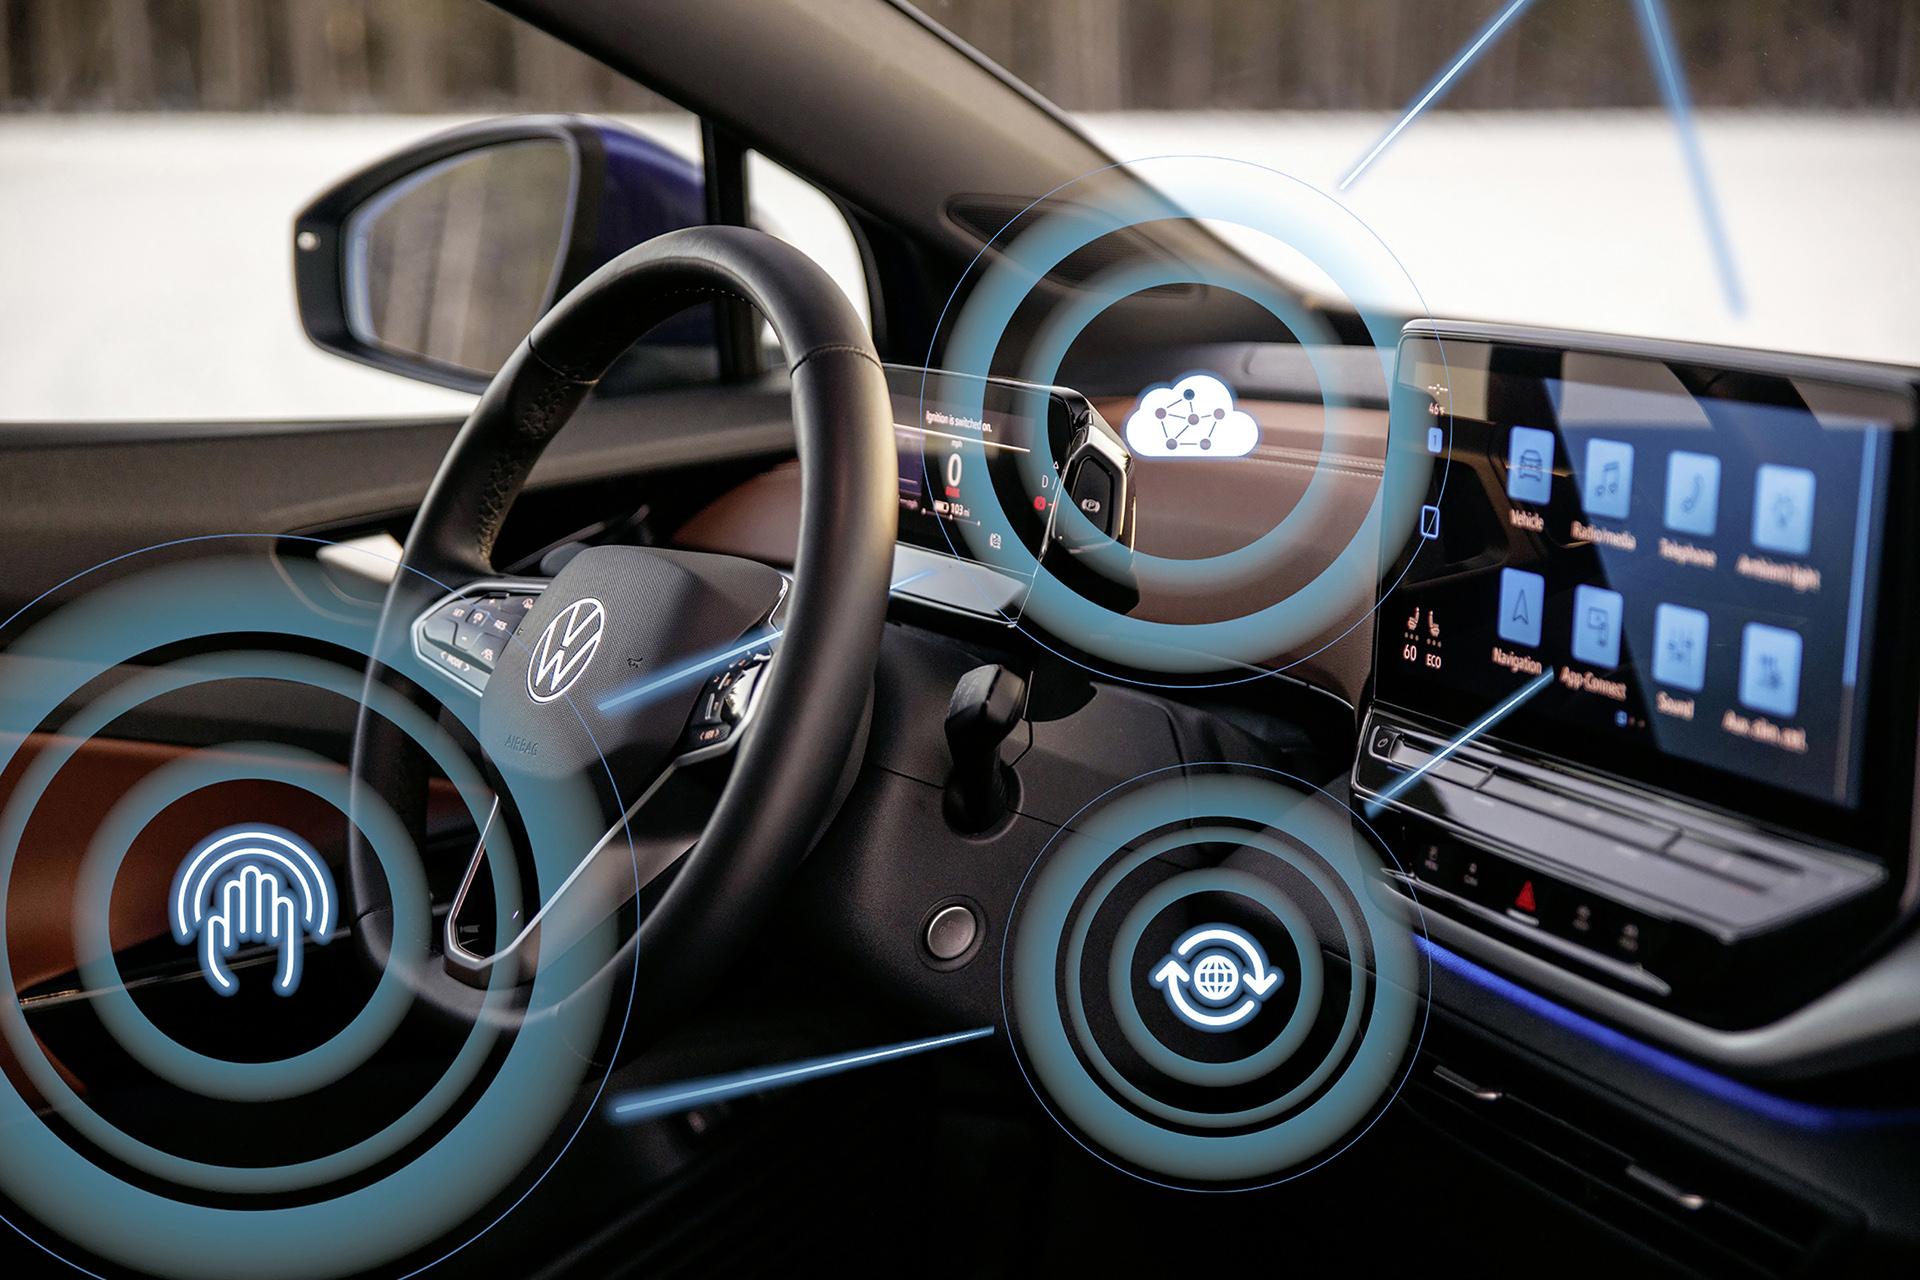 "VOLKSWAGEN INNOVATION TALK PROJECT HOUSE 3 Η Volkswagen μας αφήνει να ρίξουμε μια ""ματιά"" στο μέλλον της αυτοκίνησης Electric cars, electric vehicles, ID.3, ID.4, ID.4 GTX, Volkswagen, Volkswagen Group, Volkswagen ID.3, Volkswagen ID.4, Volkswagen ID.4 GTX, VW, VW ID.3, zblog, ειδήσεις, ηλεκτρικά, ηλεκτροκινηση, κινουμαι ηλεκτρικα, Νέα"